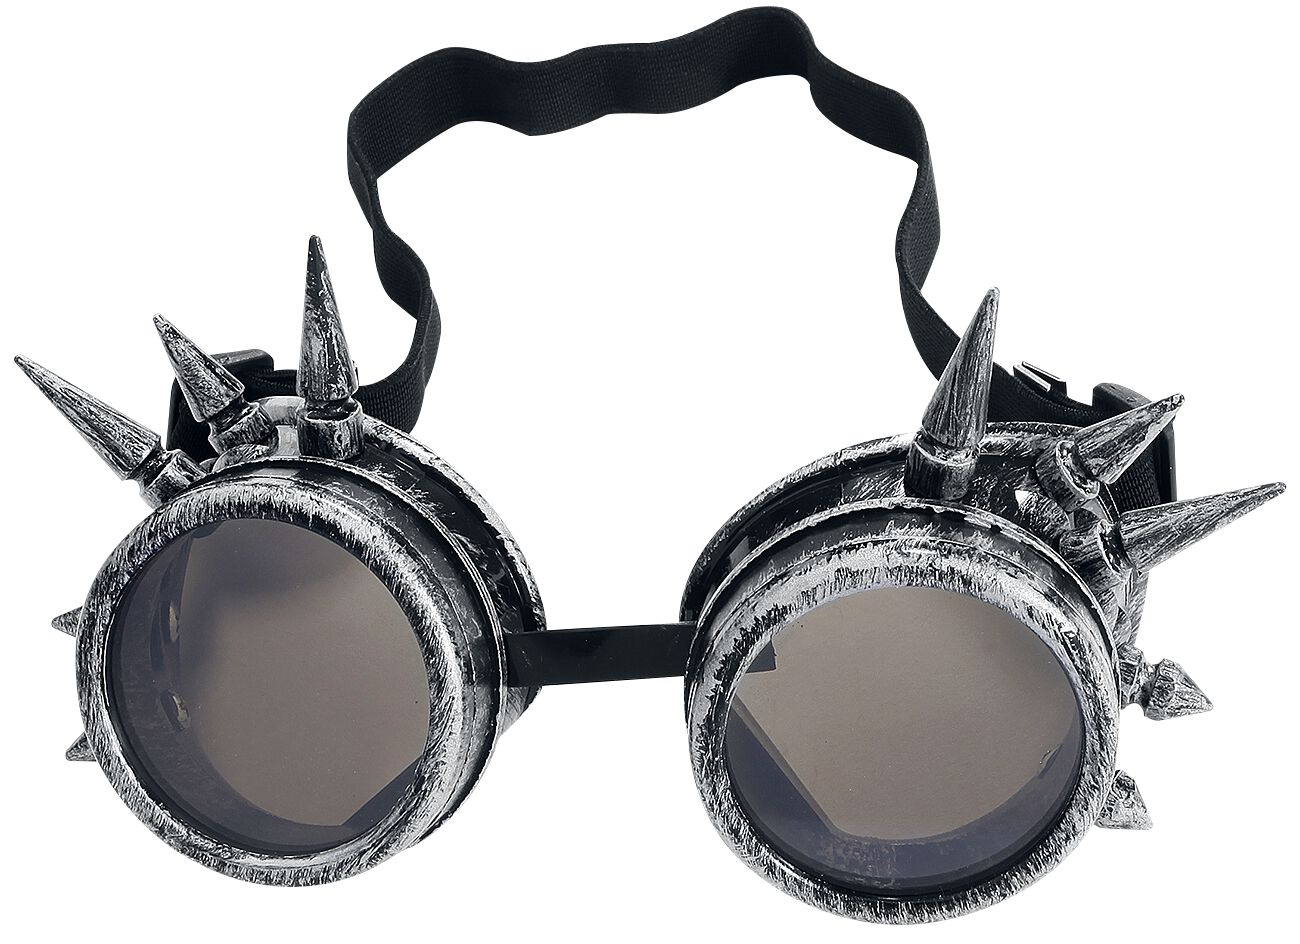 Marki - Okulary - Okulary Alcatraz Spiked Cyber Goggle Okulary standard - 315427